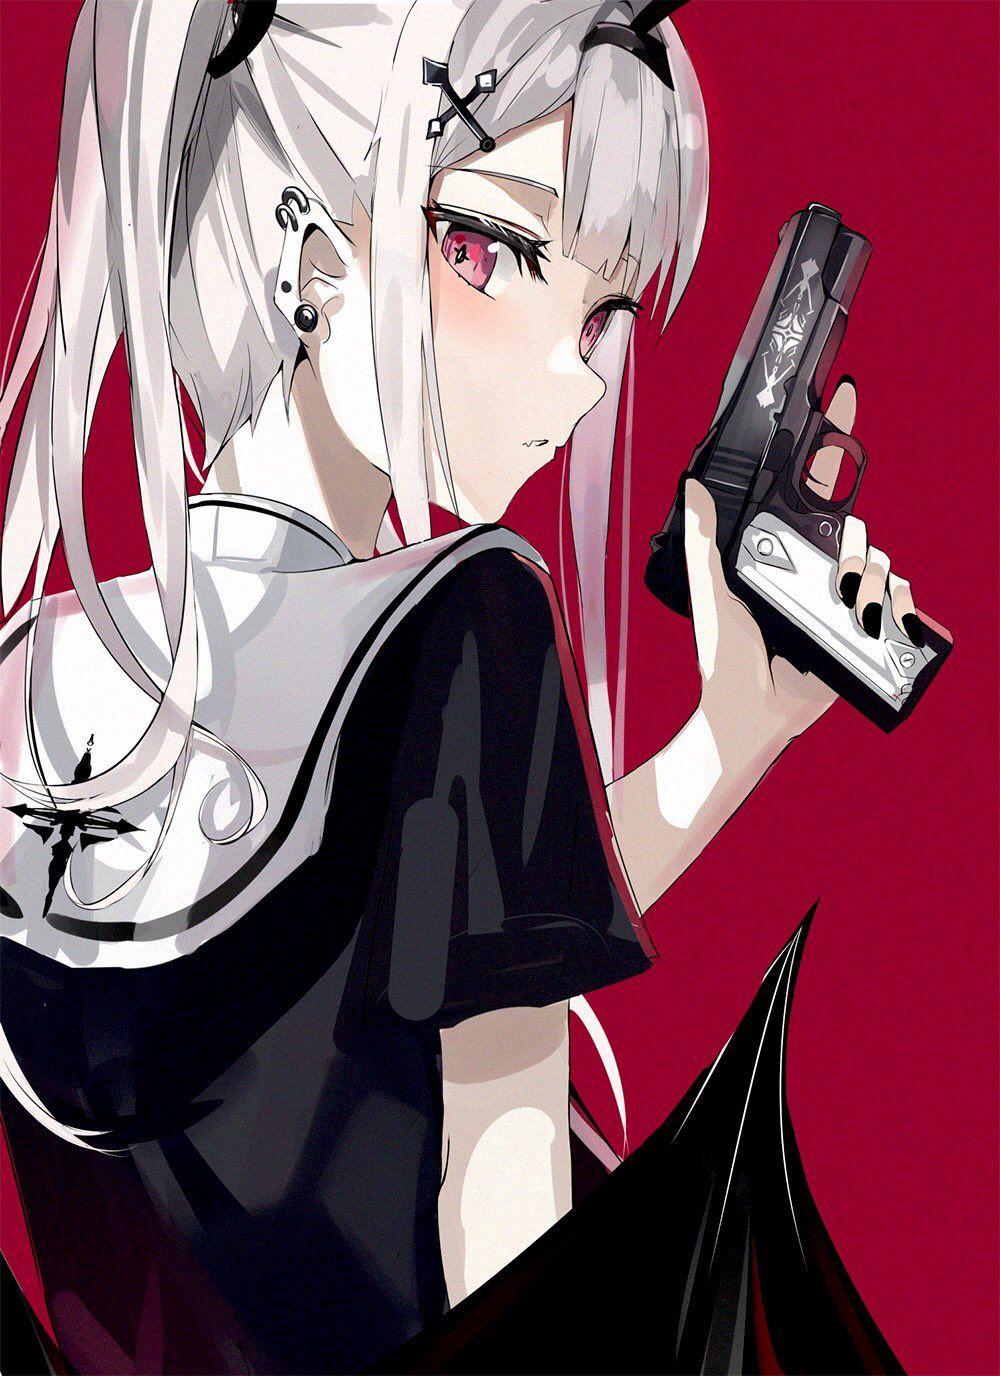 Pin on Anime 9D girl